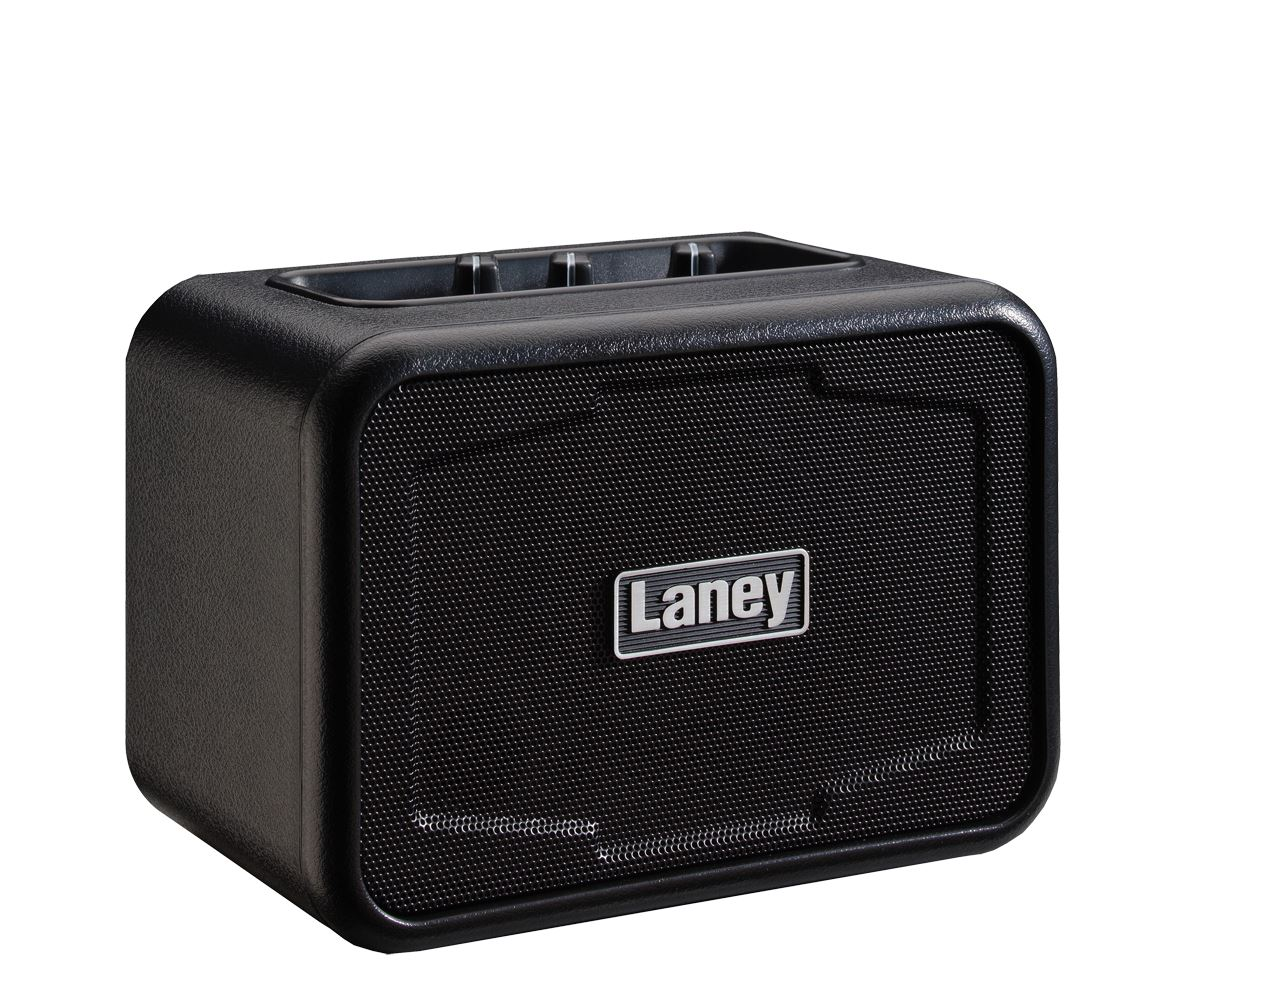 Laney Mini Iron 2 Channel Amp w/ Smartphone Insert Technology